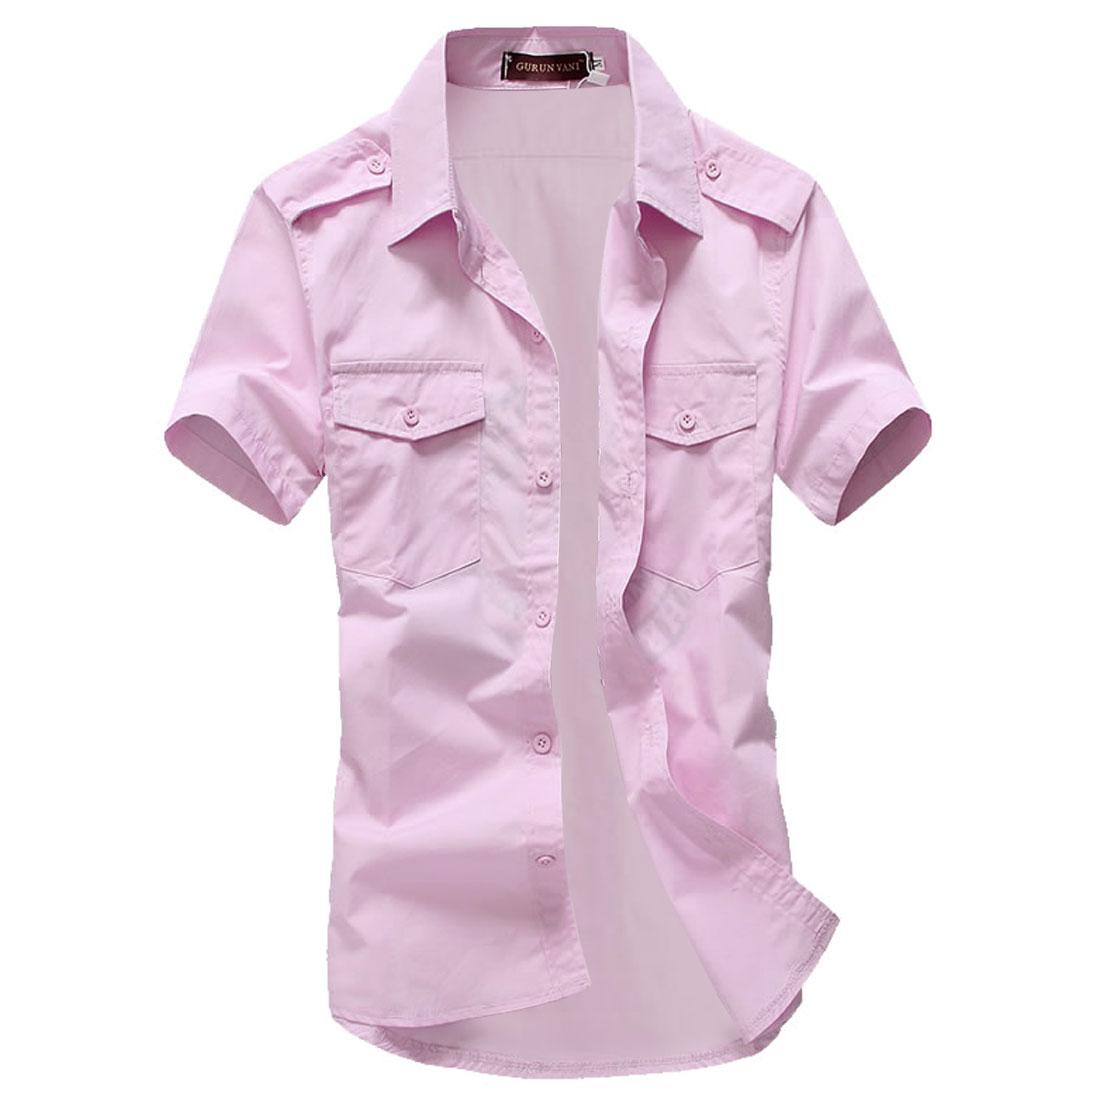 Men Short-sleeved Buttoned Front Flap Pockets Shirt Light Pink L